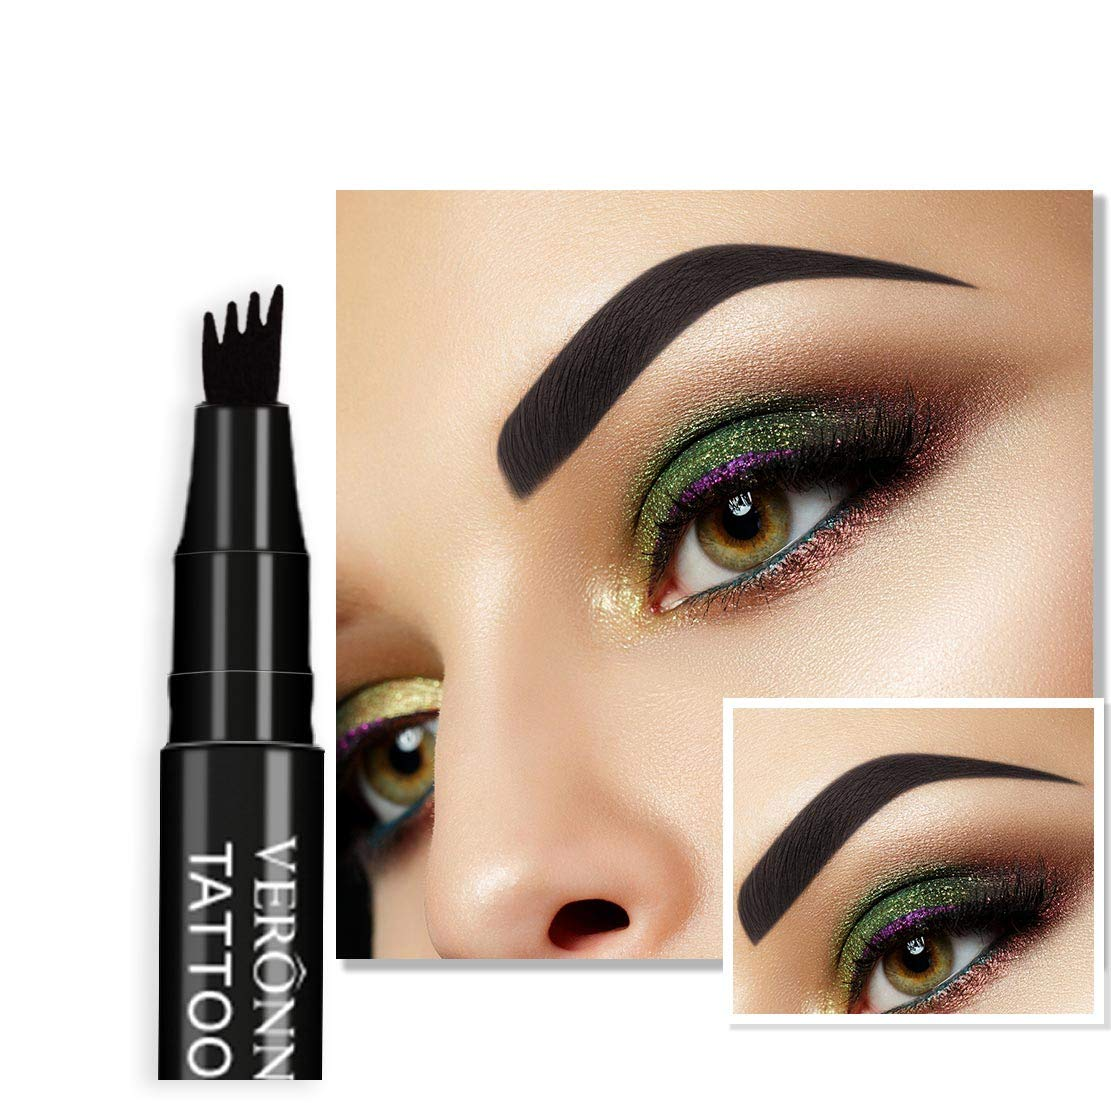 Amaping Liquid Eyebrow Pencil Lasting Waterproof Multifunctional Automatic Eyebrow Pencil Makeup Kit Permanent Microblading (D)